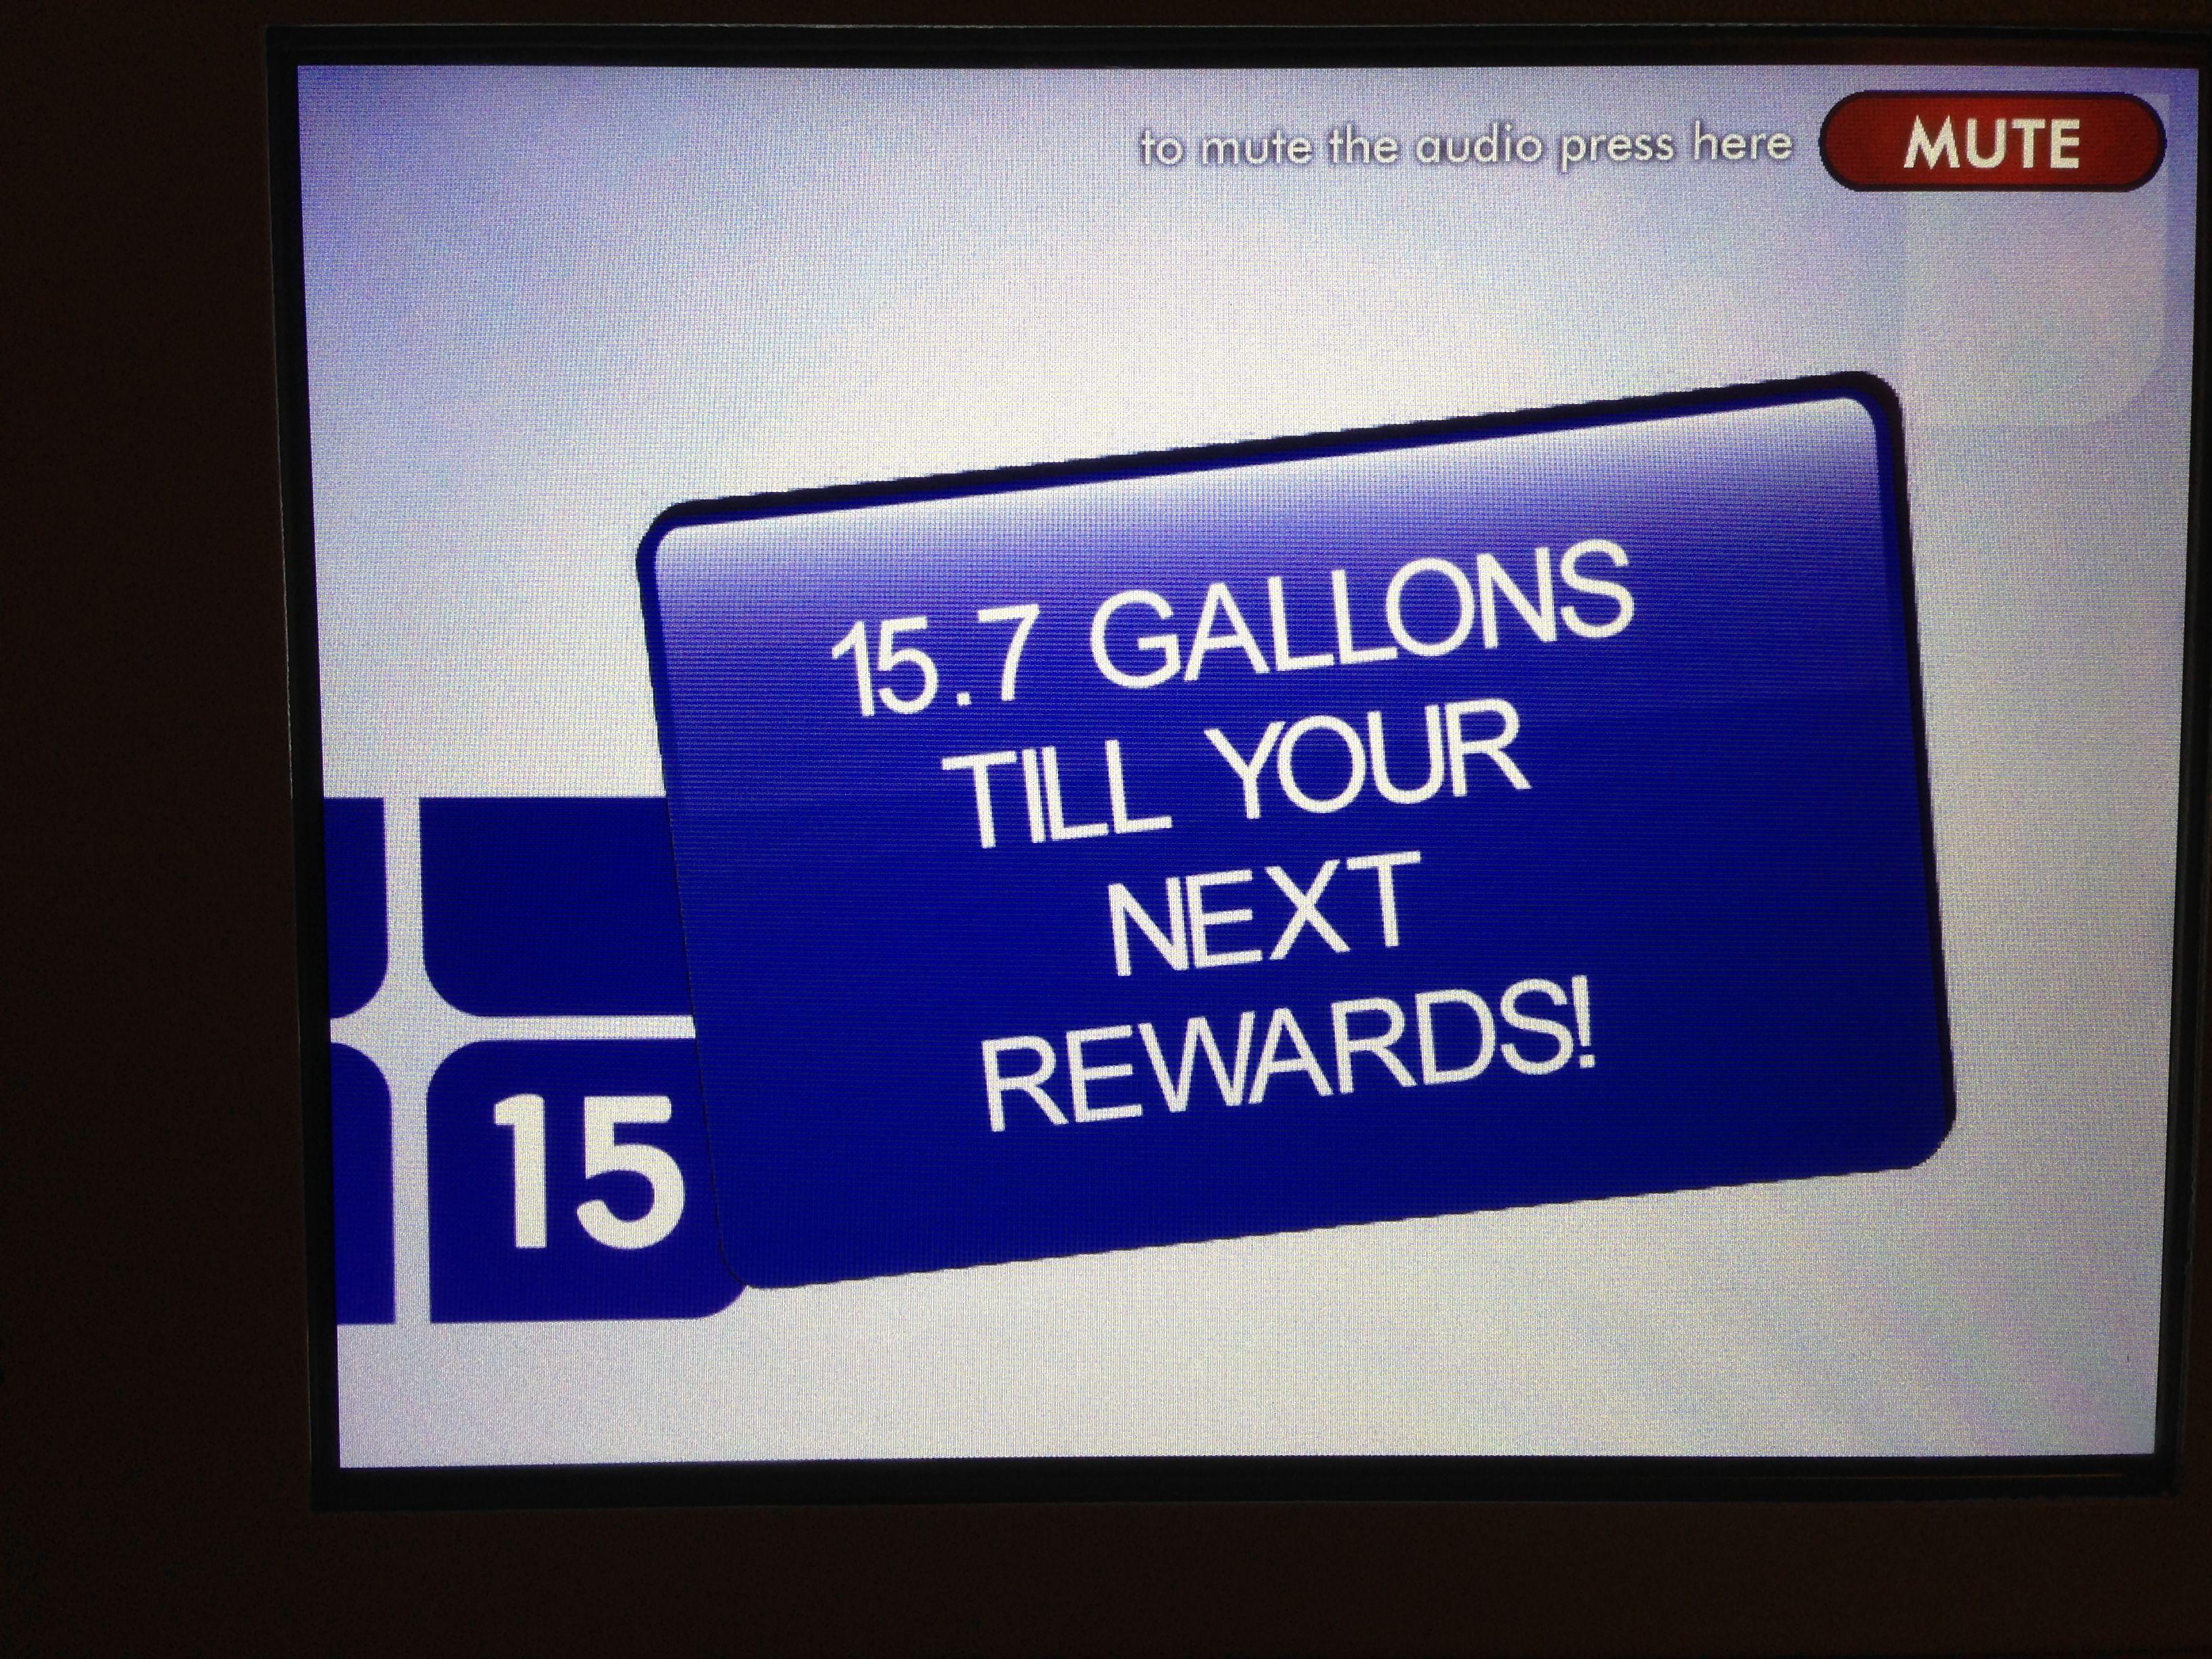 irving rewards card messaging - Irving Rewards Card